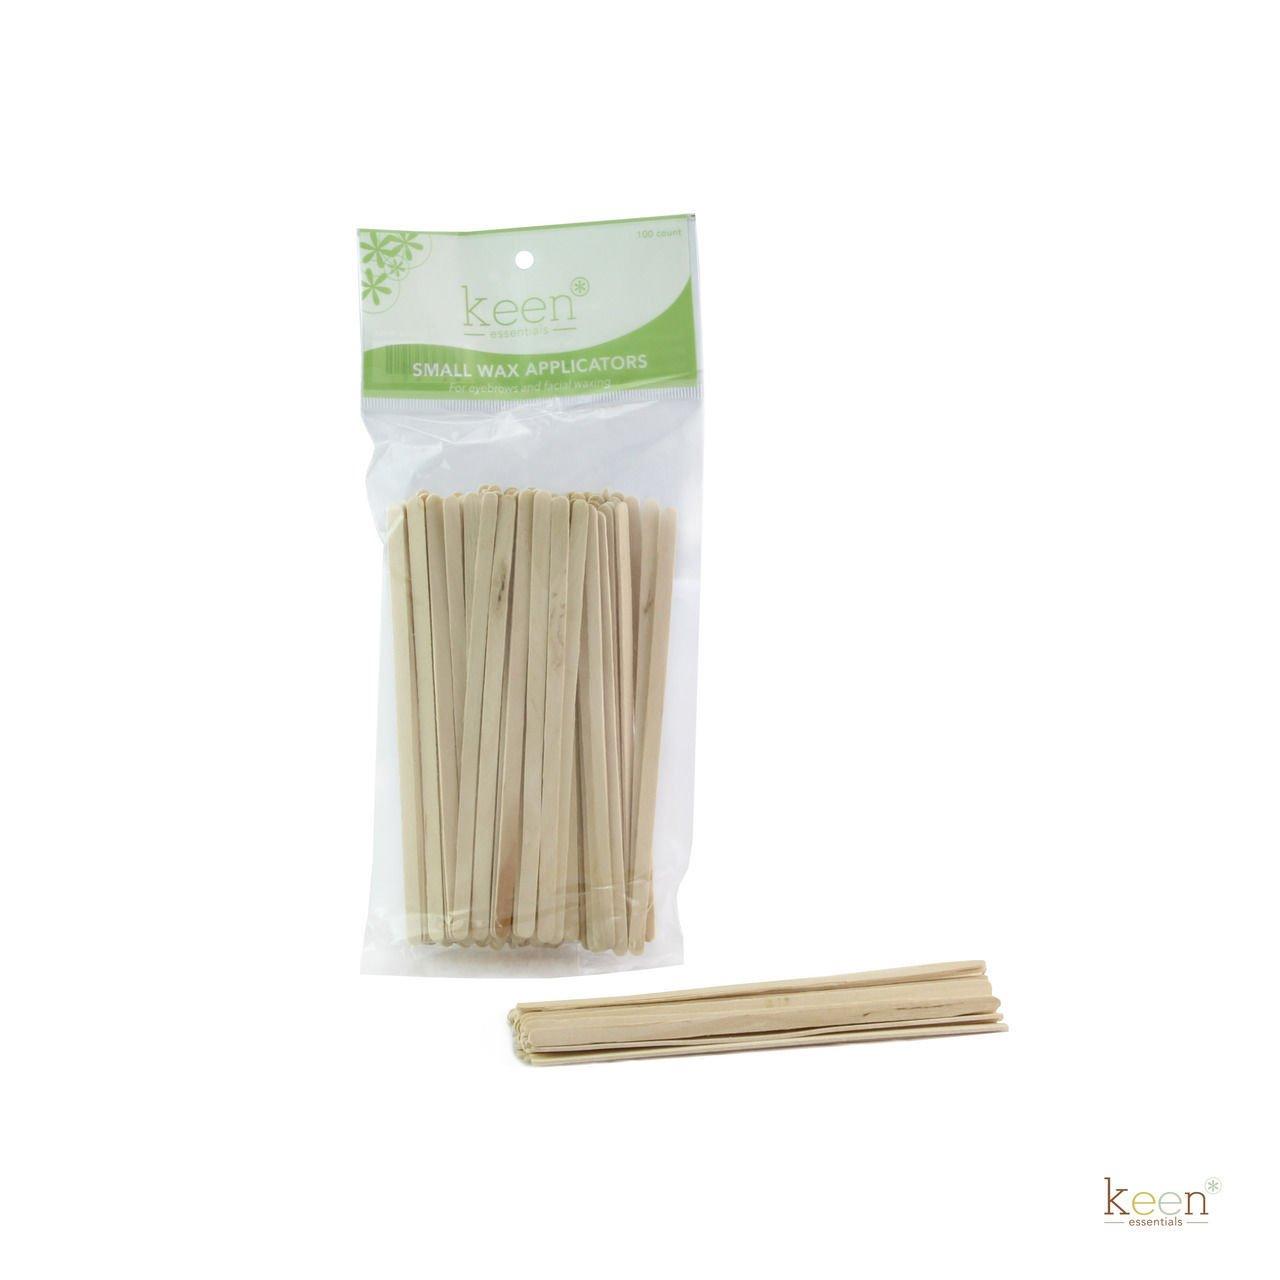 KEEN 100 pcs Small Wooden Sticks Wax Applicators, Coffee Stir sticks, Crafts KEEN ESSENTIALS